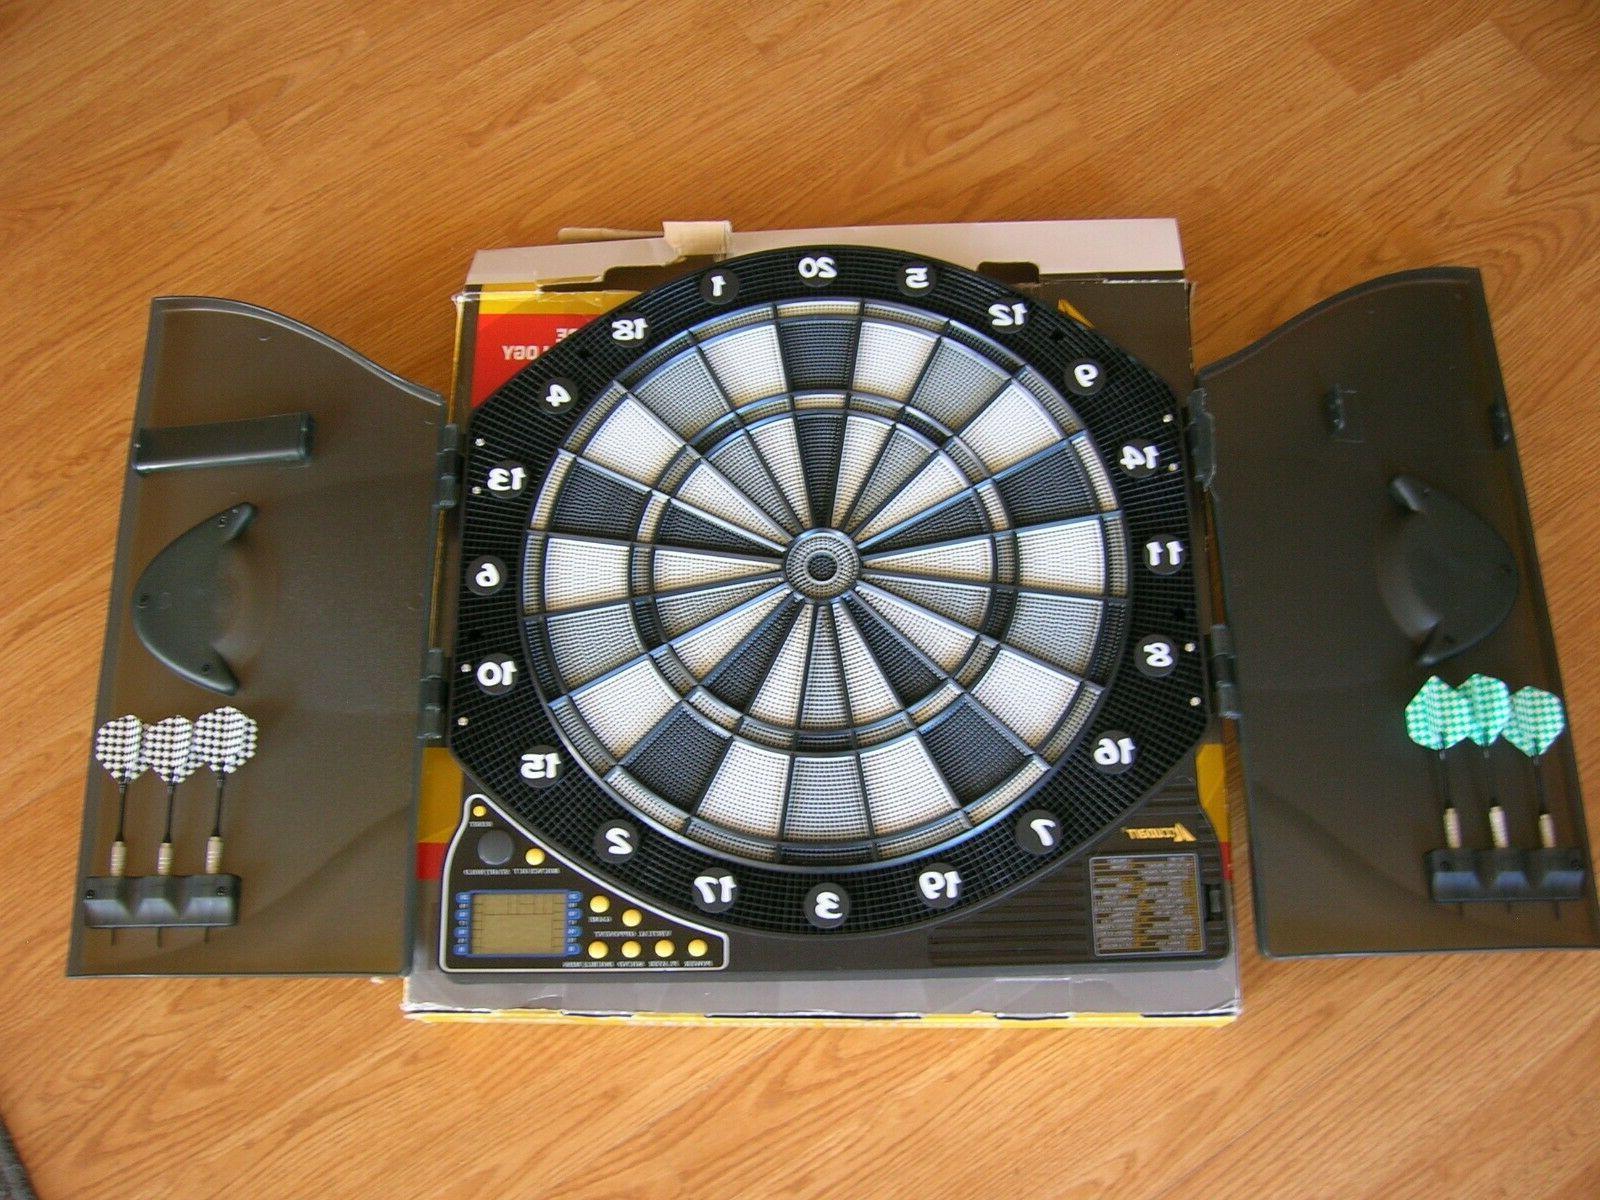 Accudart EX5000 & Games 174 Variations 6 Darts